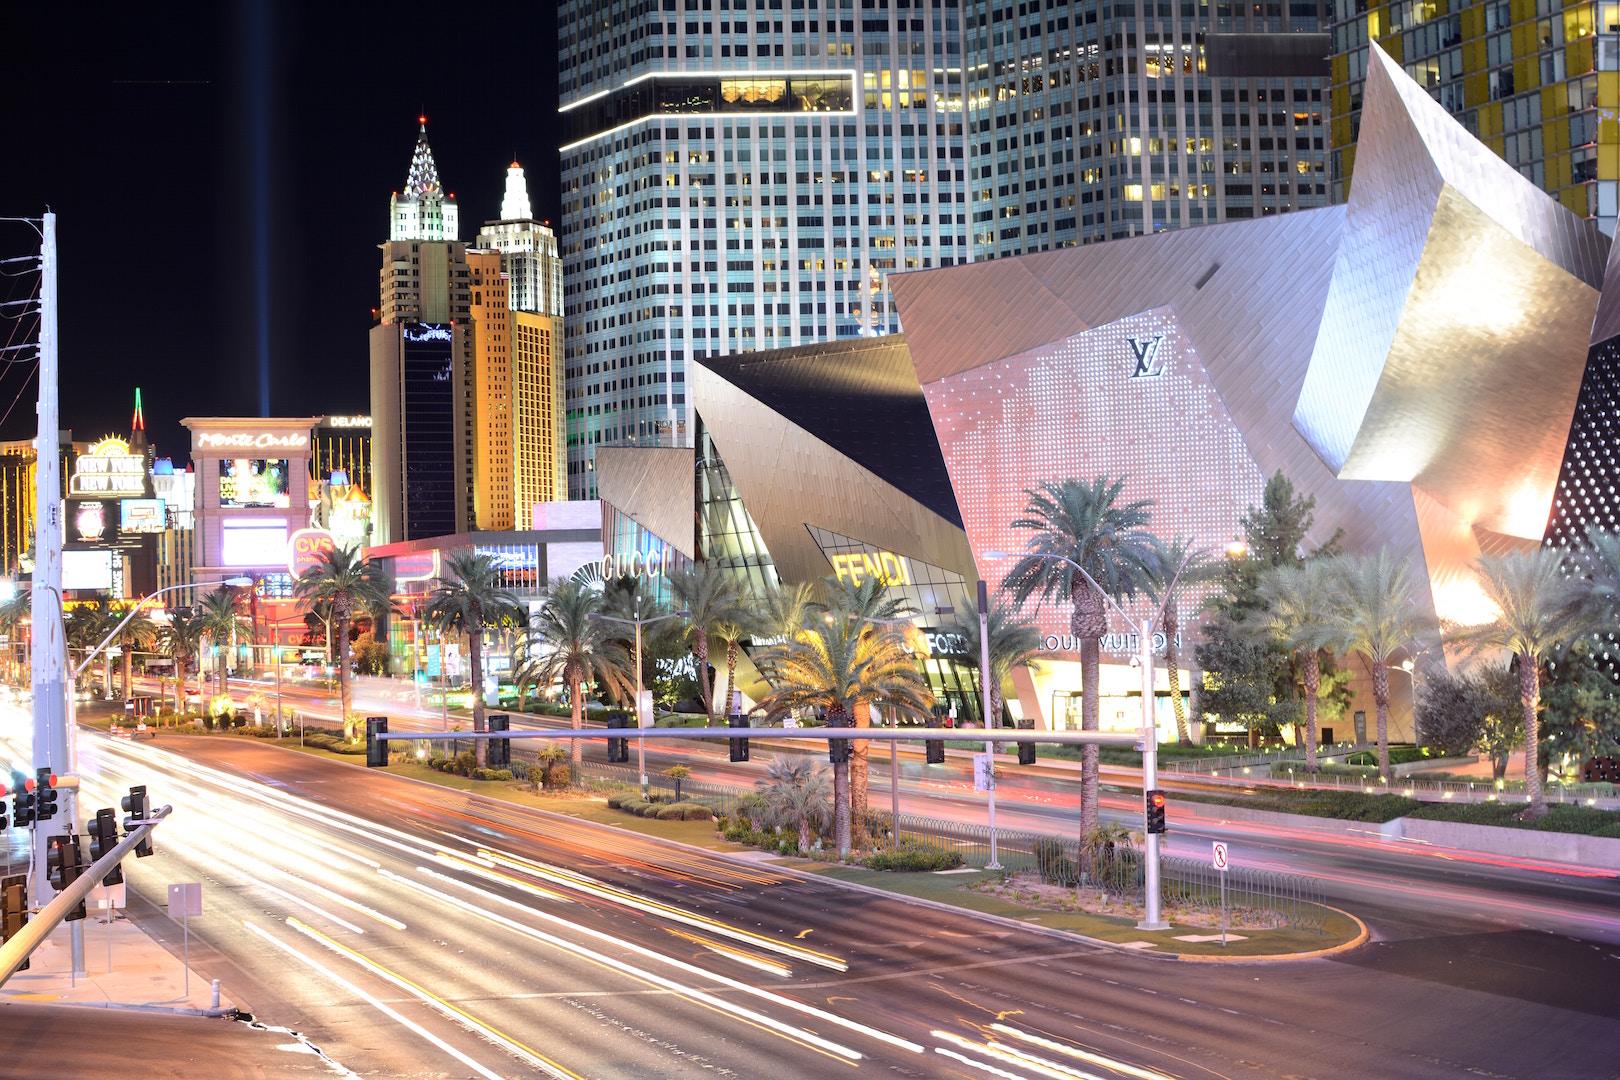 Lavish Las Vegas Gets More Expensive for Some Tourists